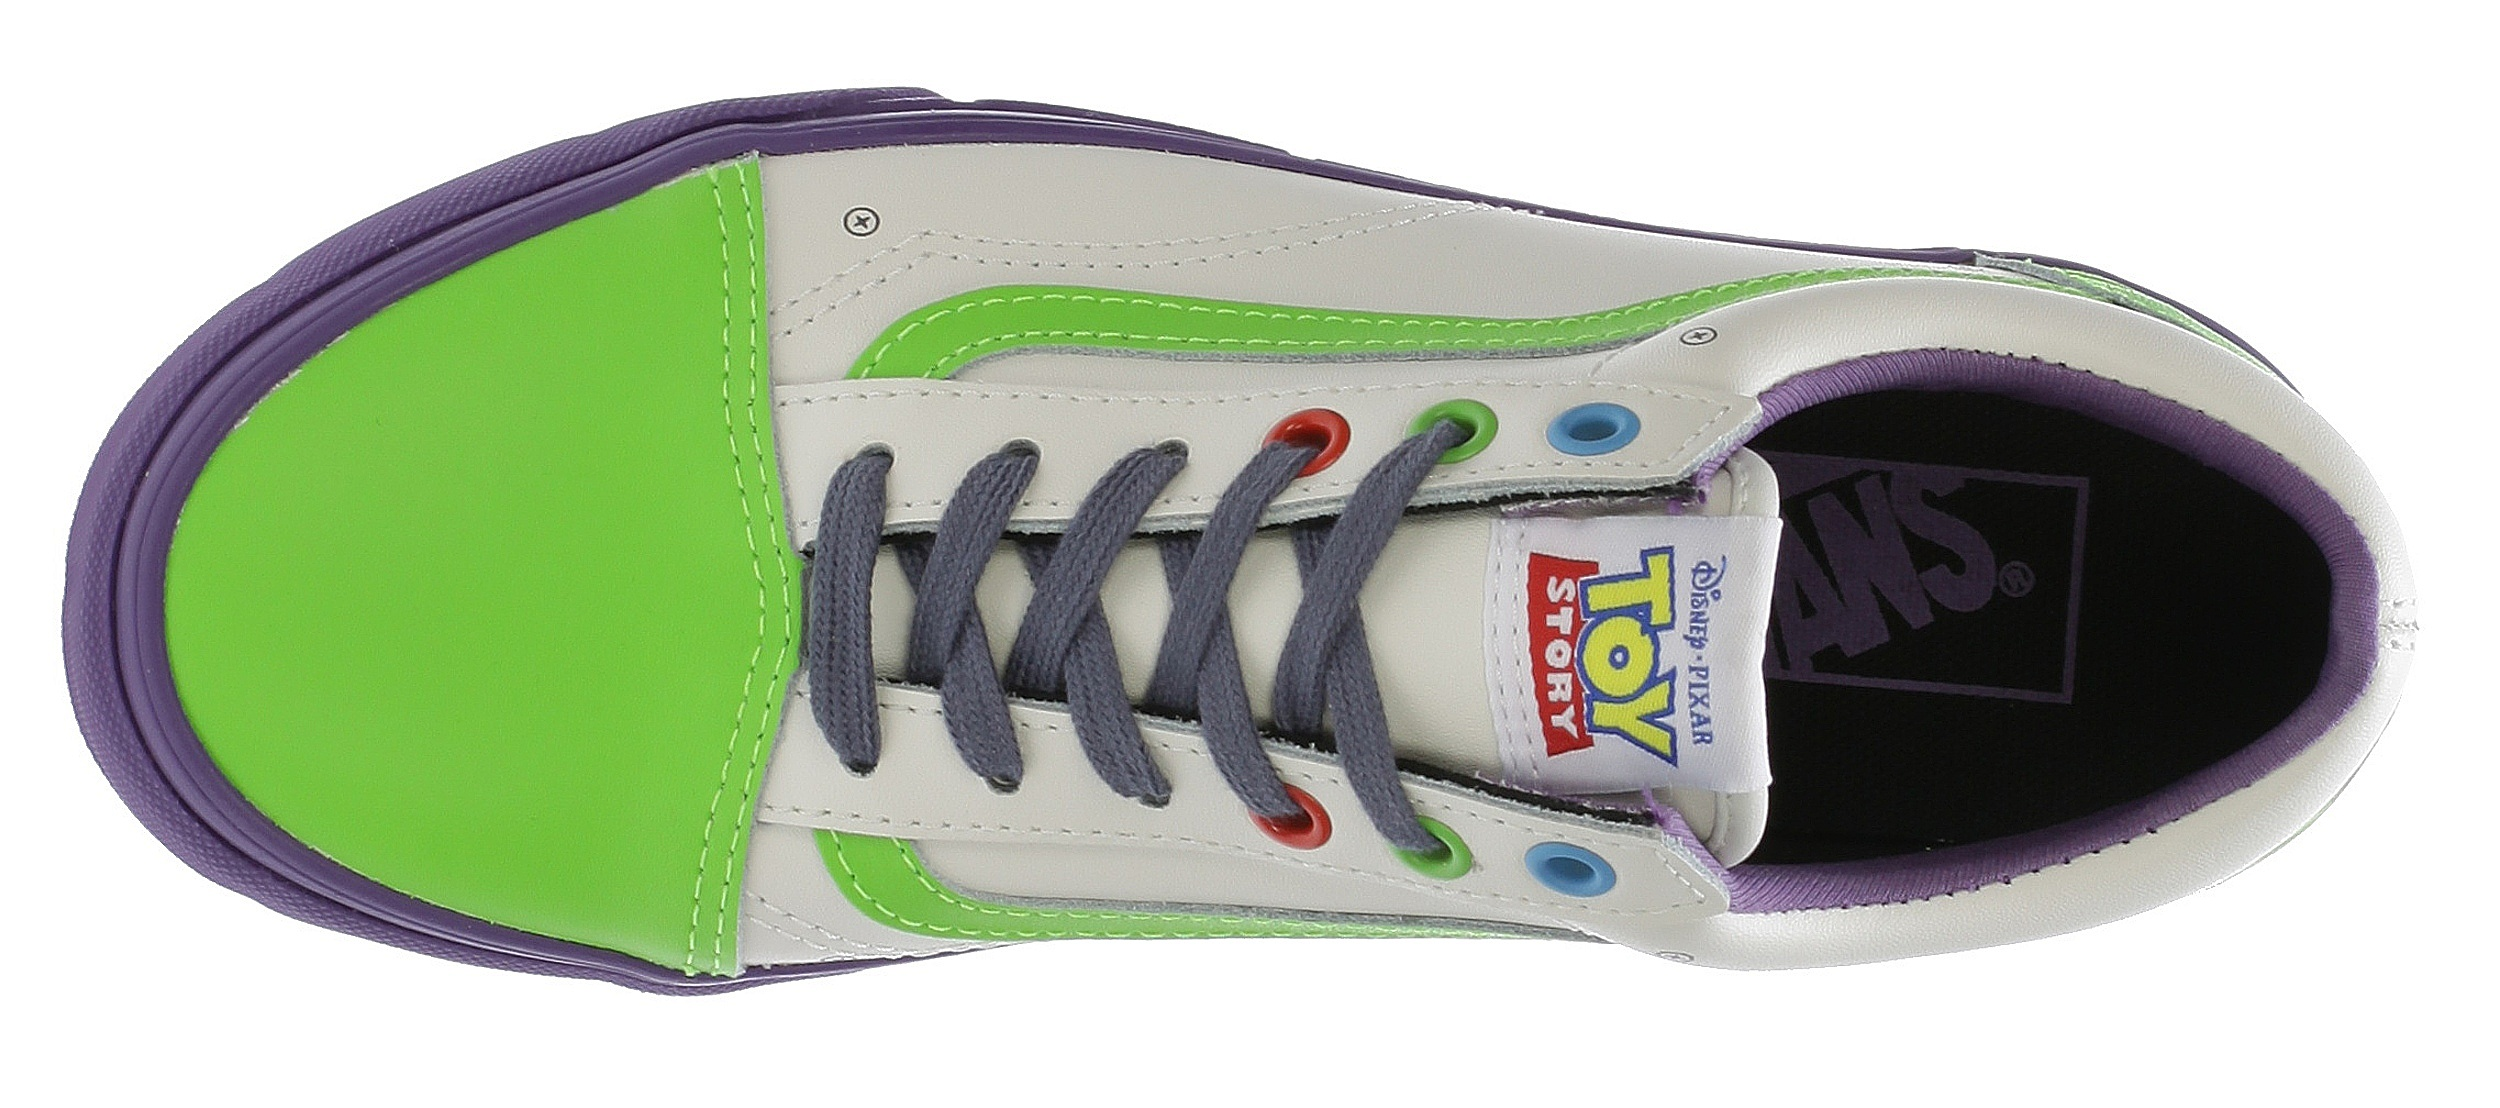 boty Vans Old Skool - Toy Story/Buzz Lightyear/True White ...